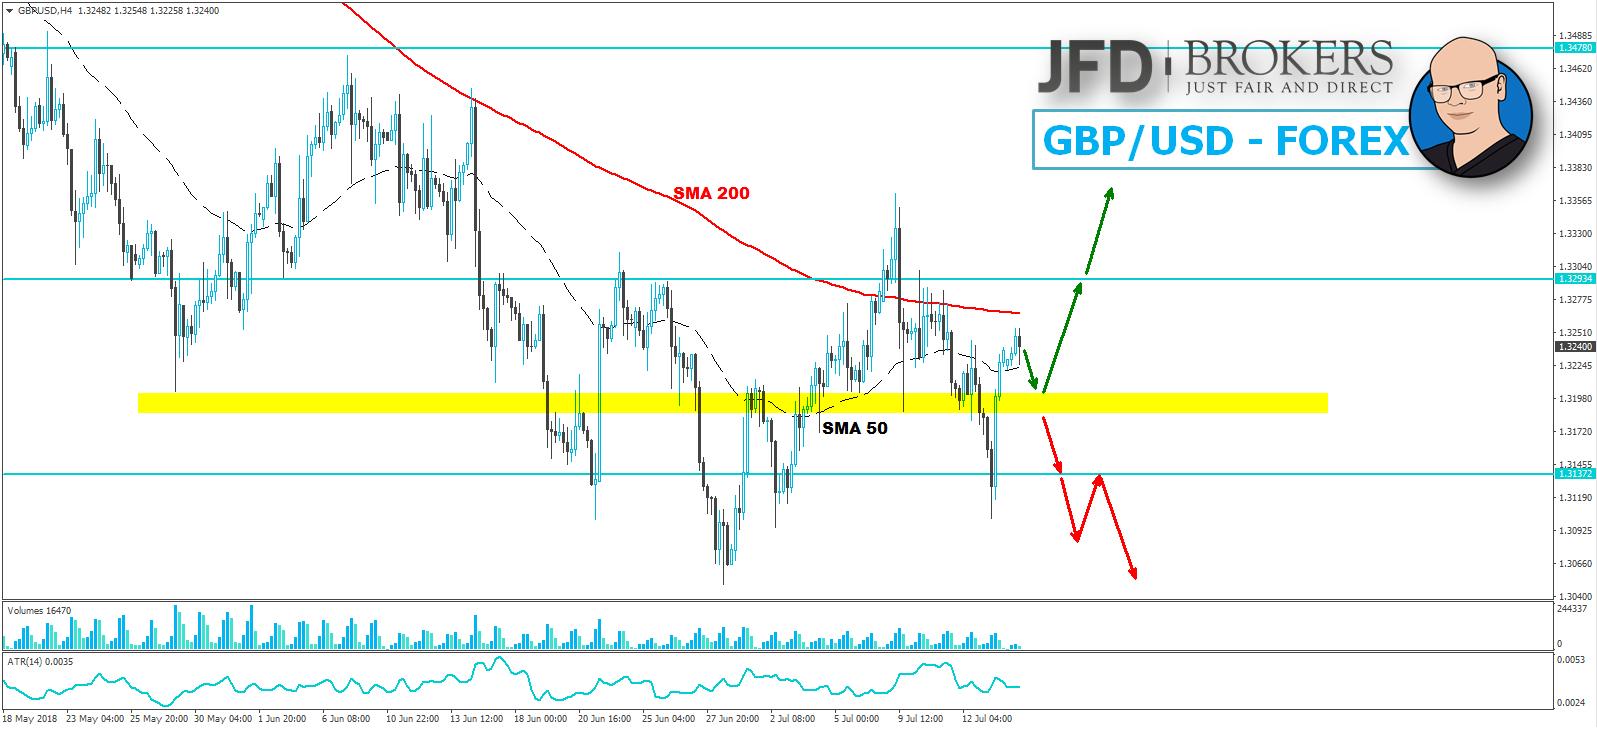 JFD-Wochenausblick-EUR-USD-GBP-USD-DAX-und-WTI-16-07-2018-20-07-2018-Kommentar-JFD-Brokers-GodmodeTrader.de-2